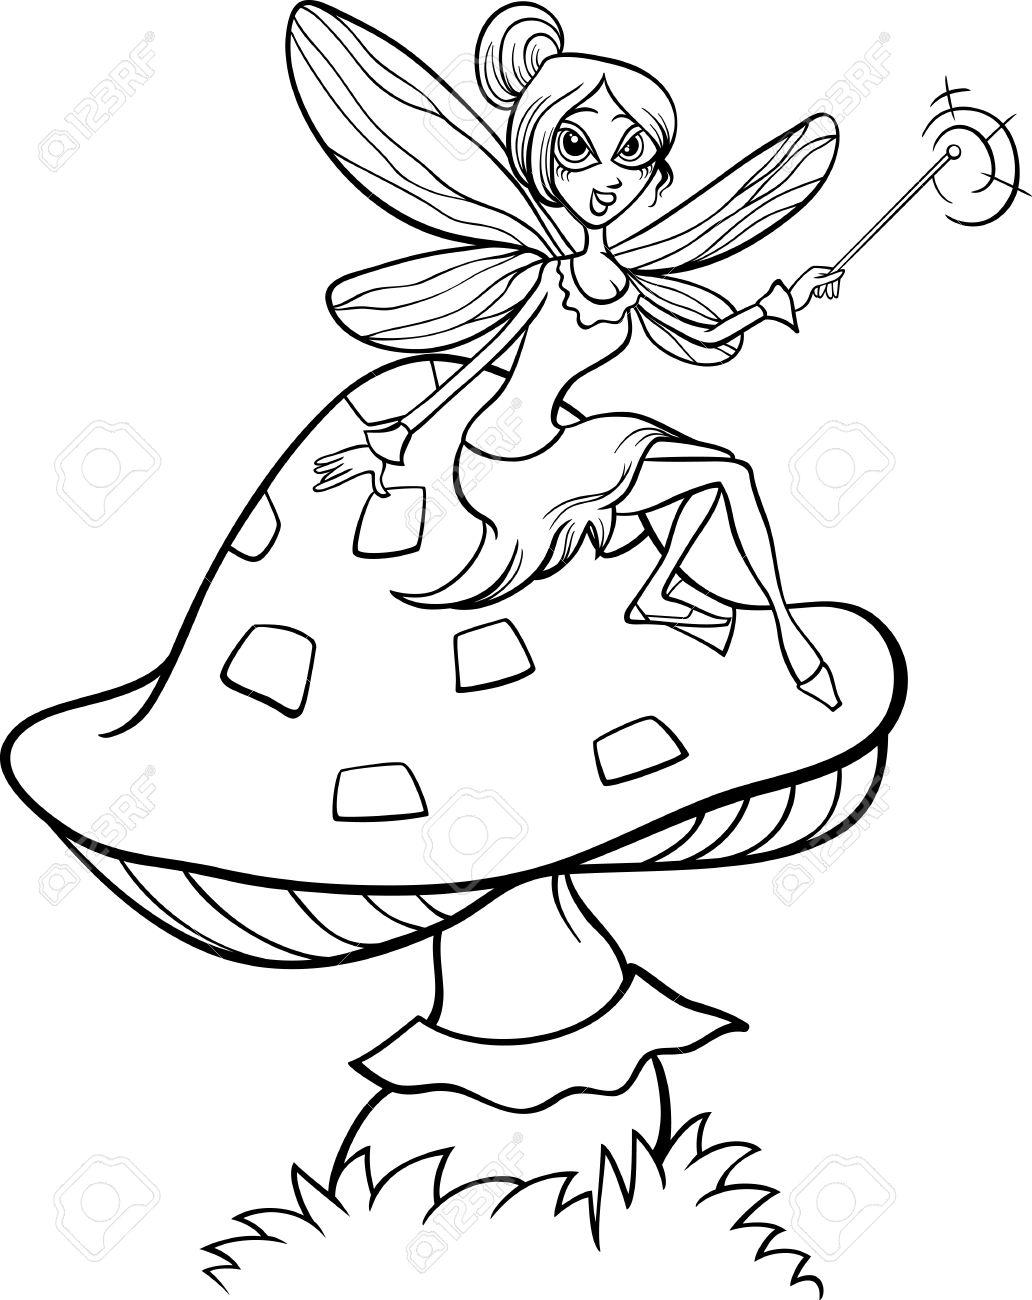 Fairy Illustration Black And White Download Illustration 2020